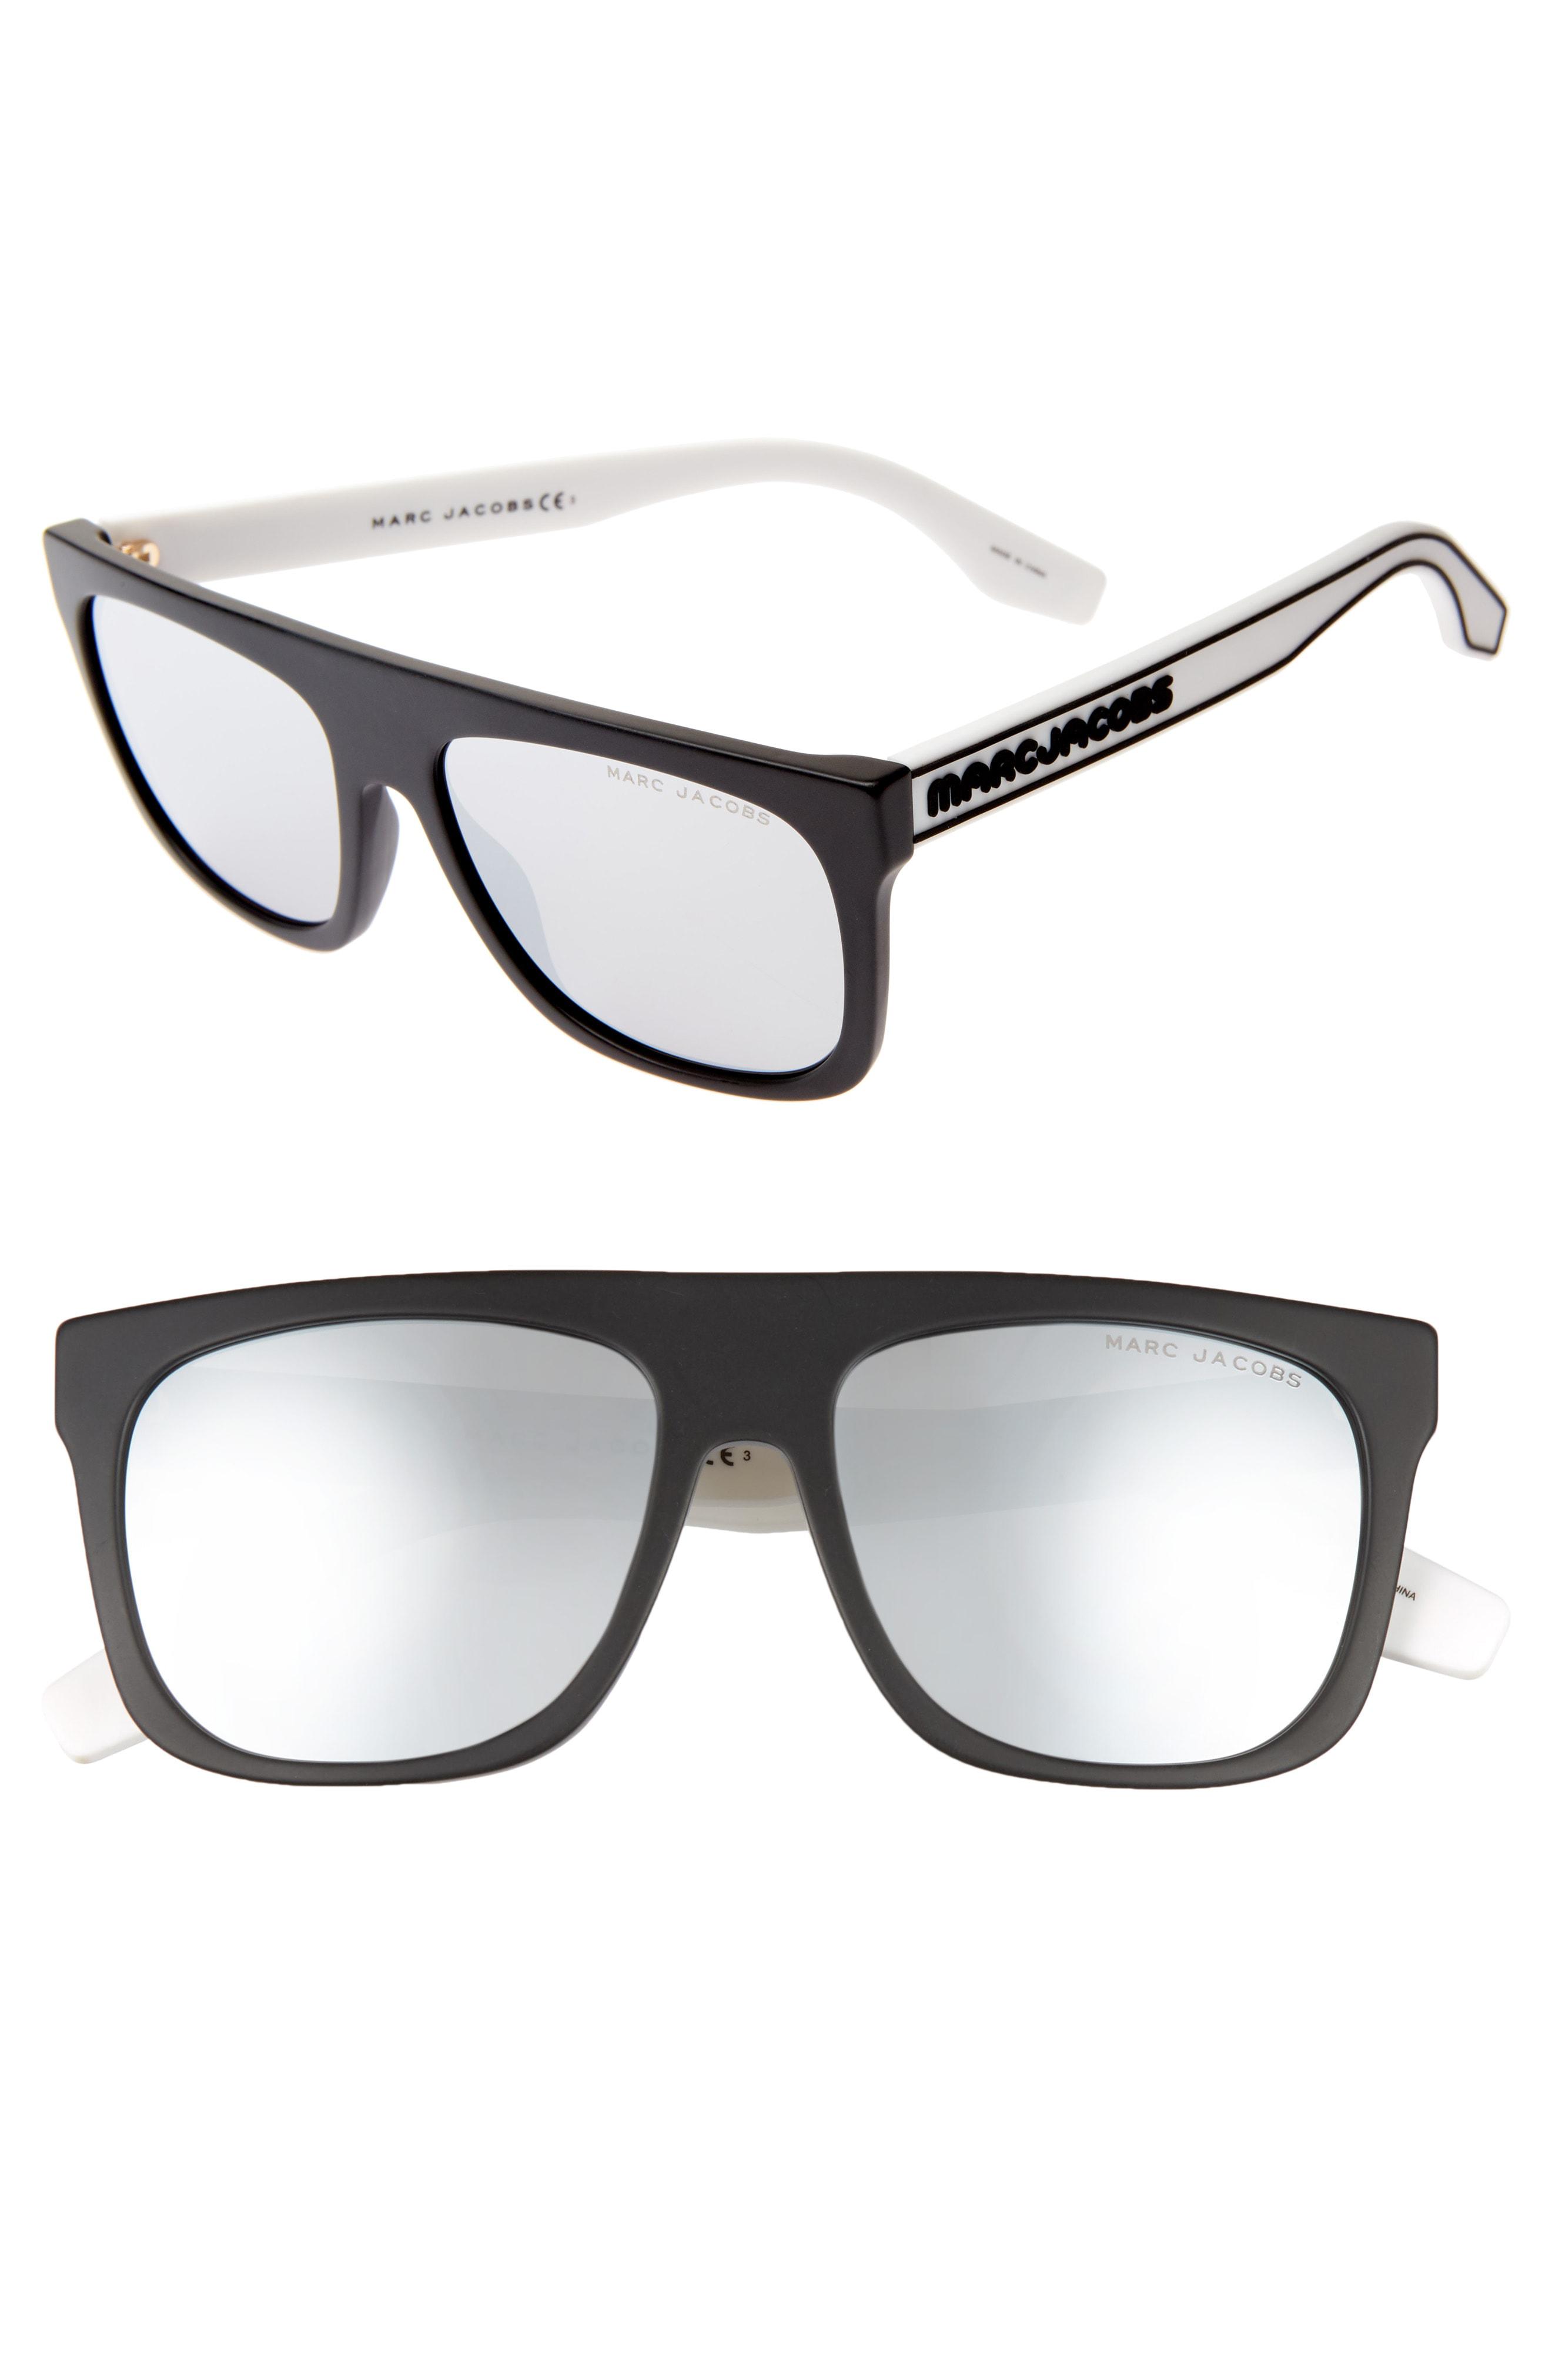 3338b60781 Marc Jacobs 56Mm Mirrored Flat Top Sunglasses - Black